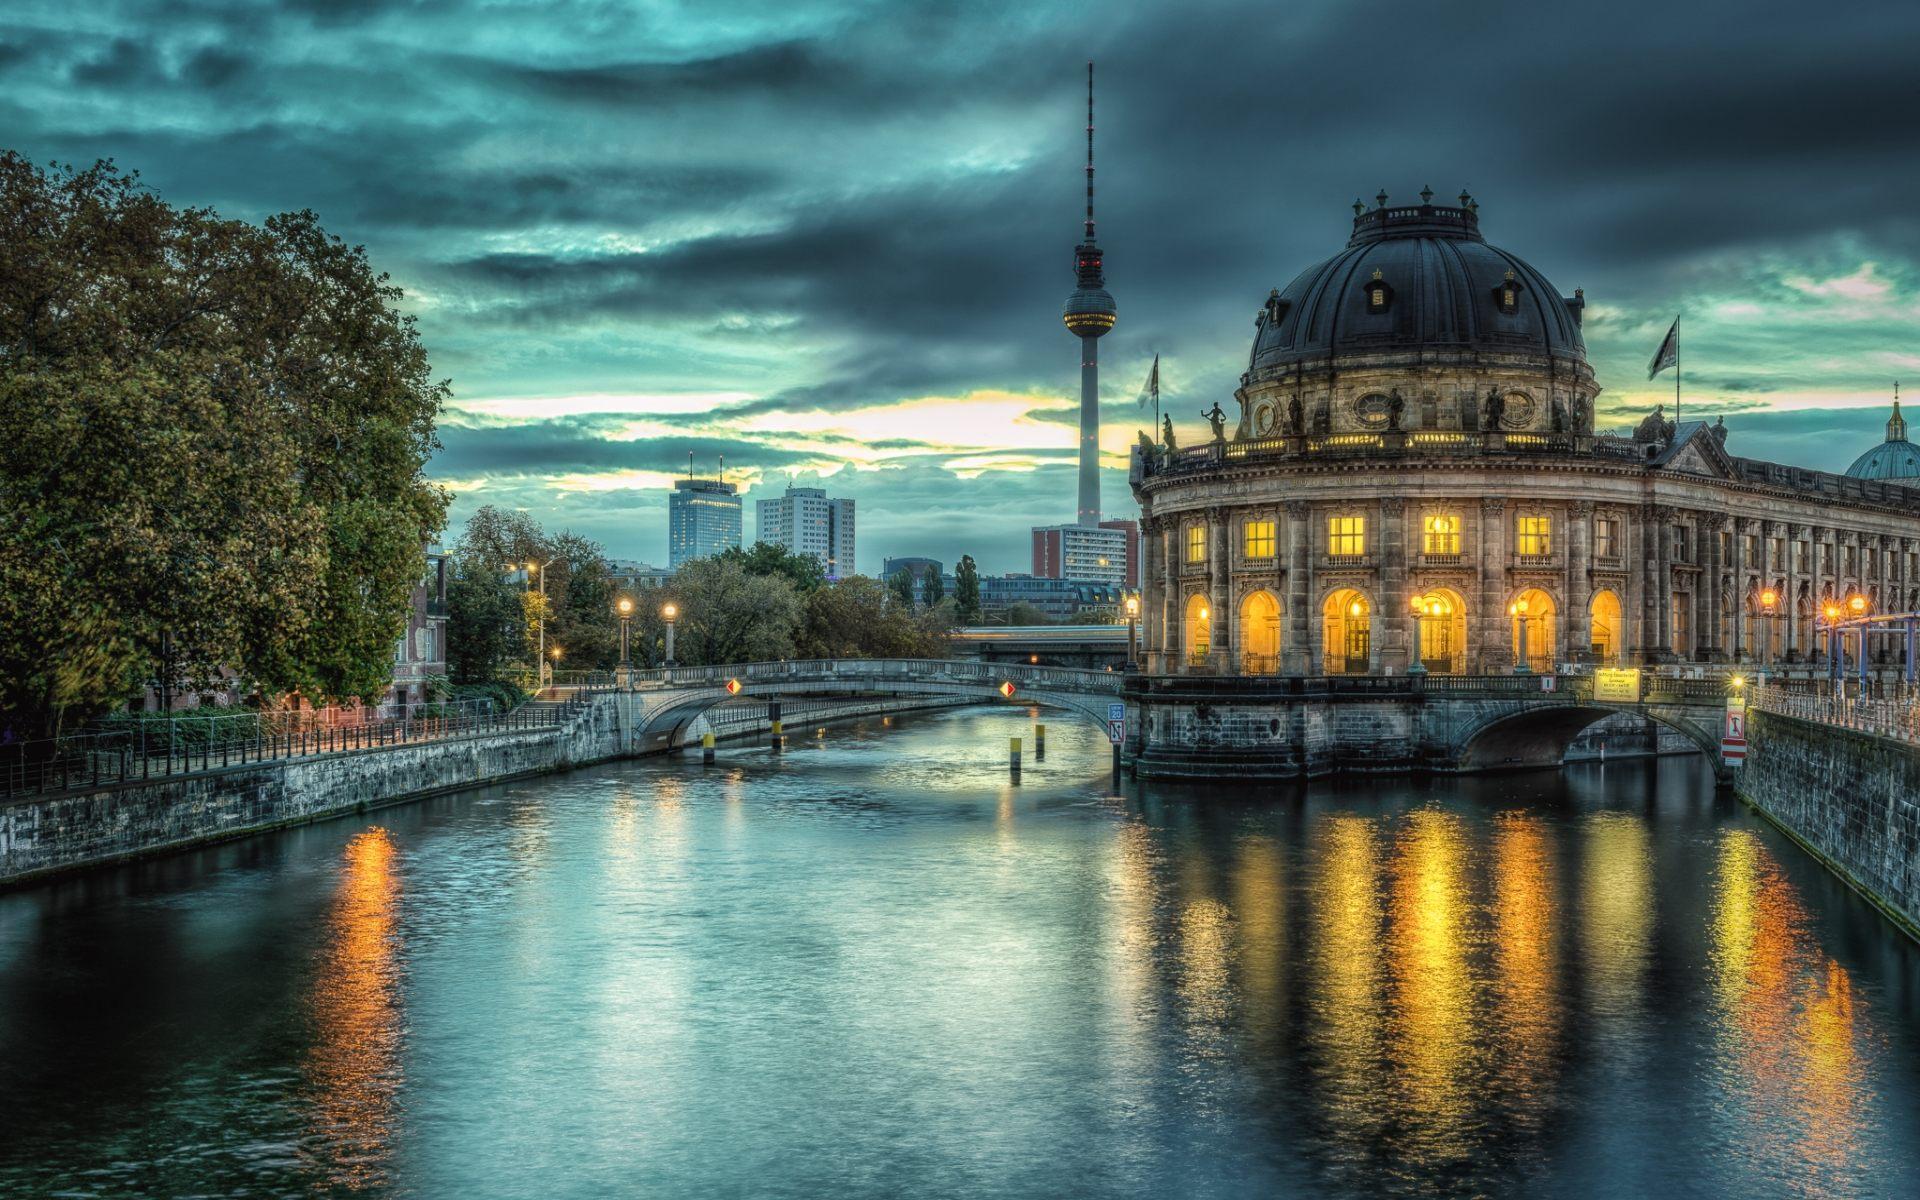 Cellphone Wallpapers Quotes Berlin Wallpapers Hd Free Download Pixelstalk Net